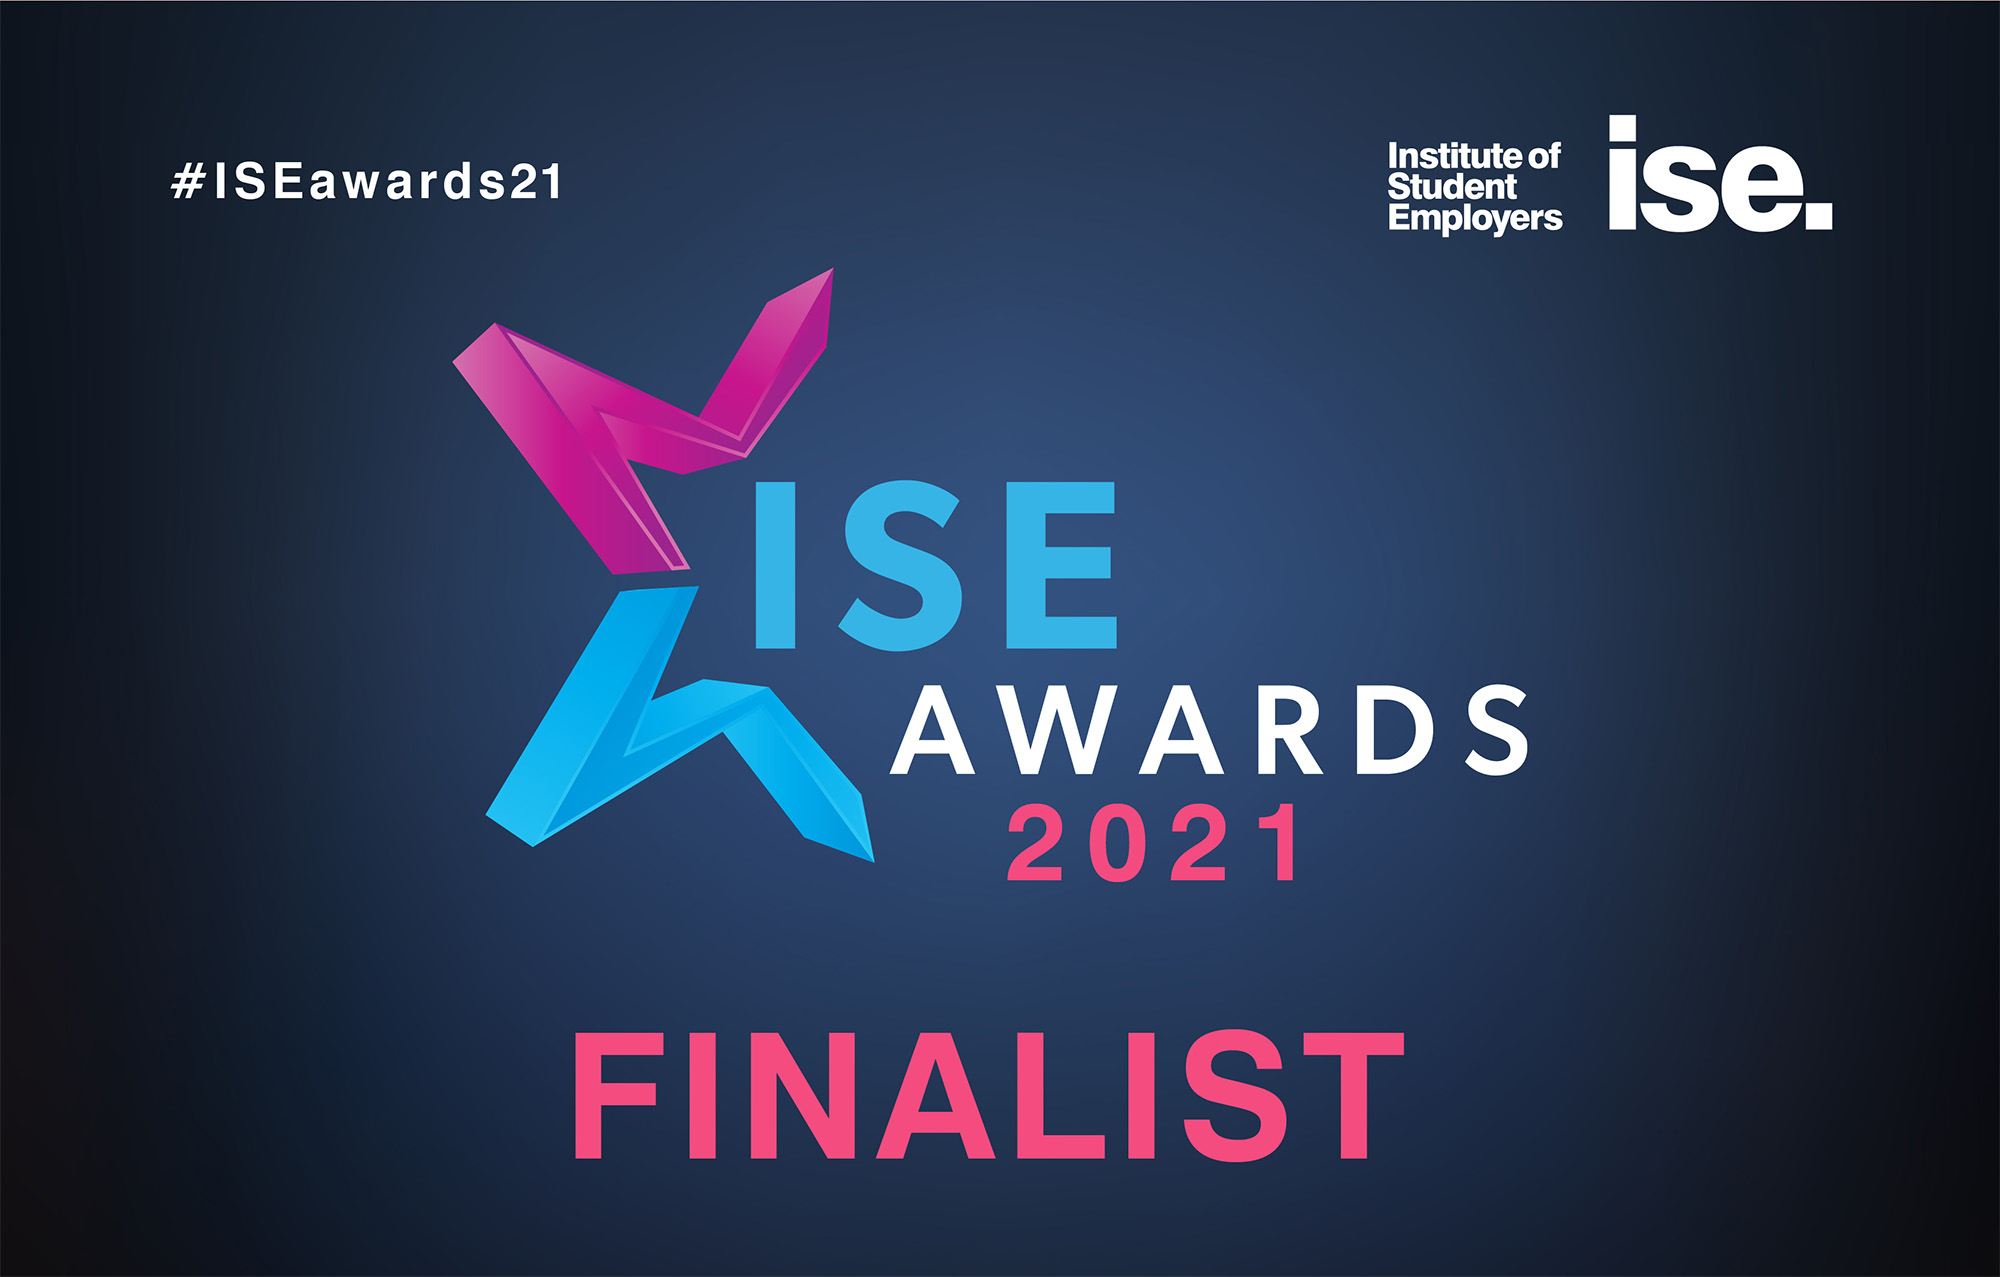 ISE Awards 2021 Finalist